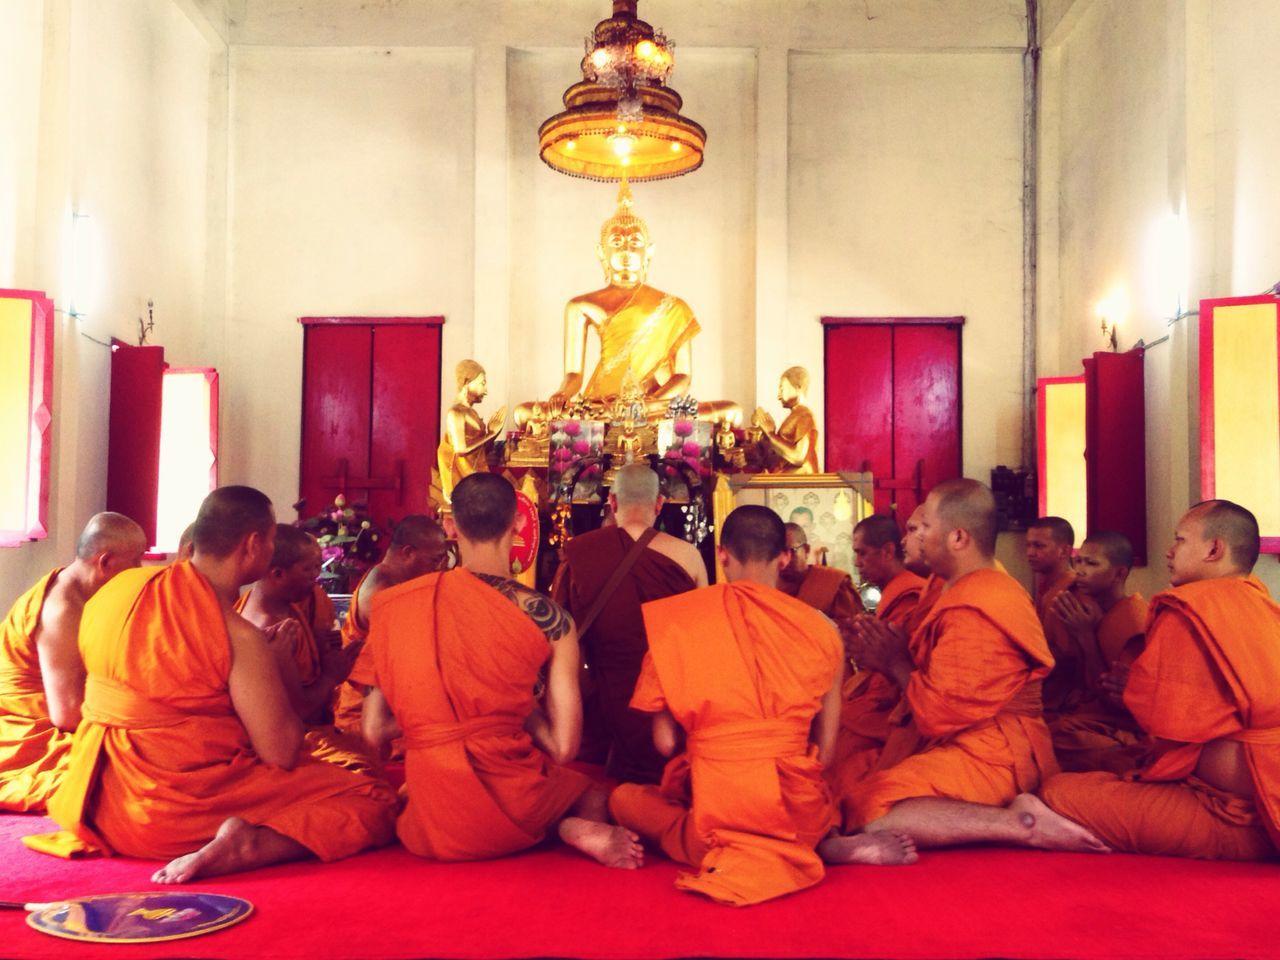 Monk  Monks Thailand Thaimonks ThaiMonk Buddhism Ordained Ordinate Buddhist Ordain Meritt Makemerits Thai Temple